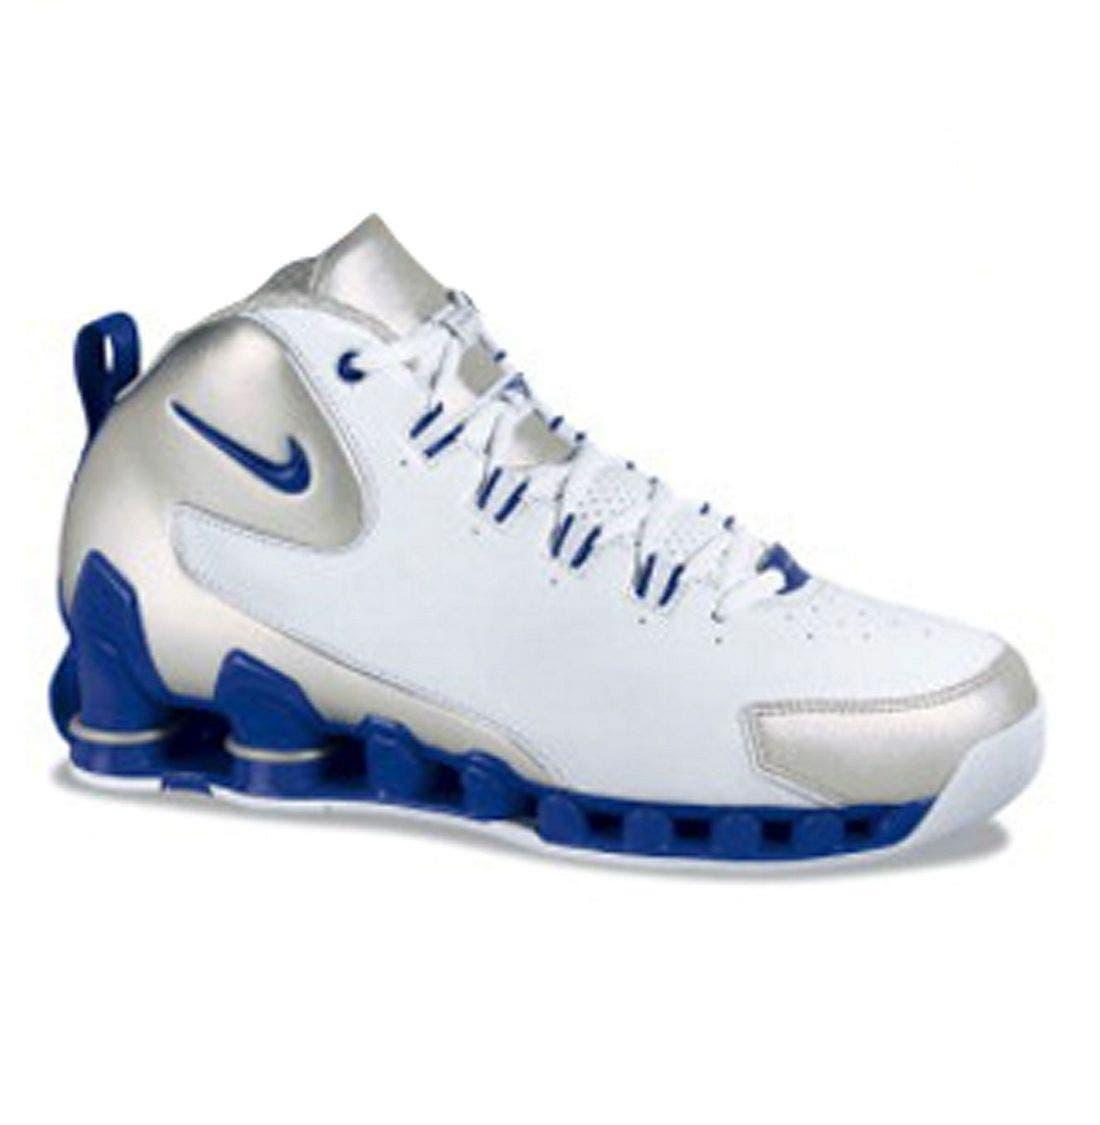 NIKE 'Nike Shox VC III' Basketball Shoe, Main, color, WBU